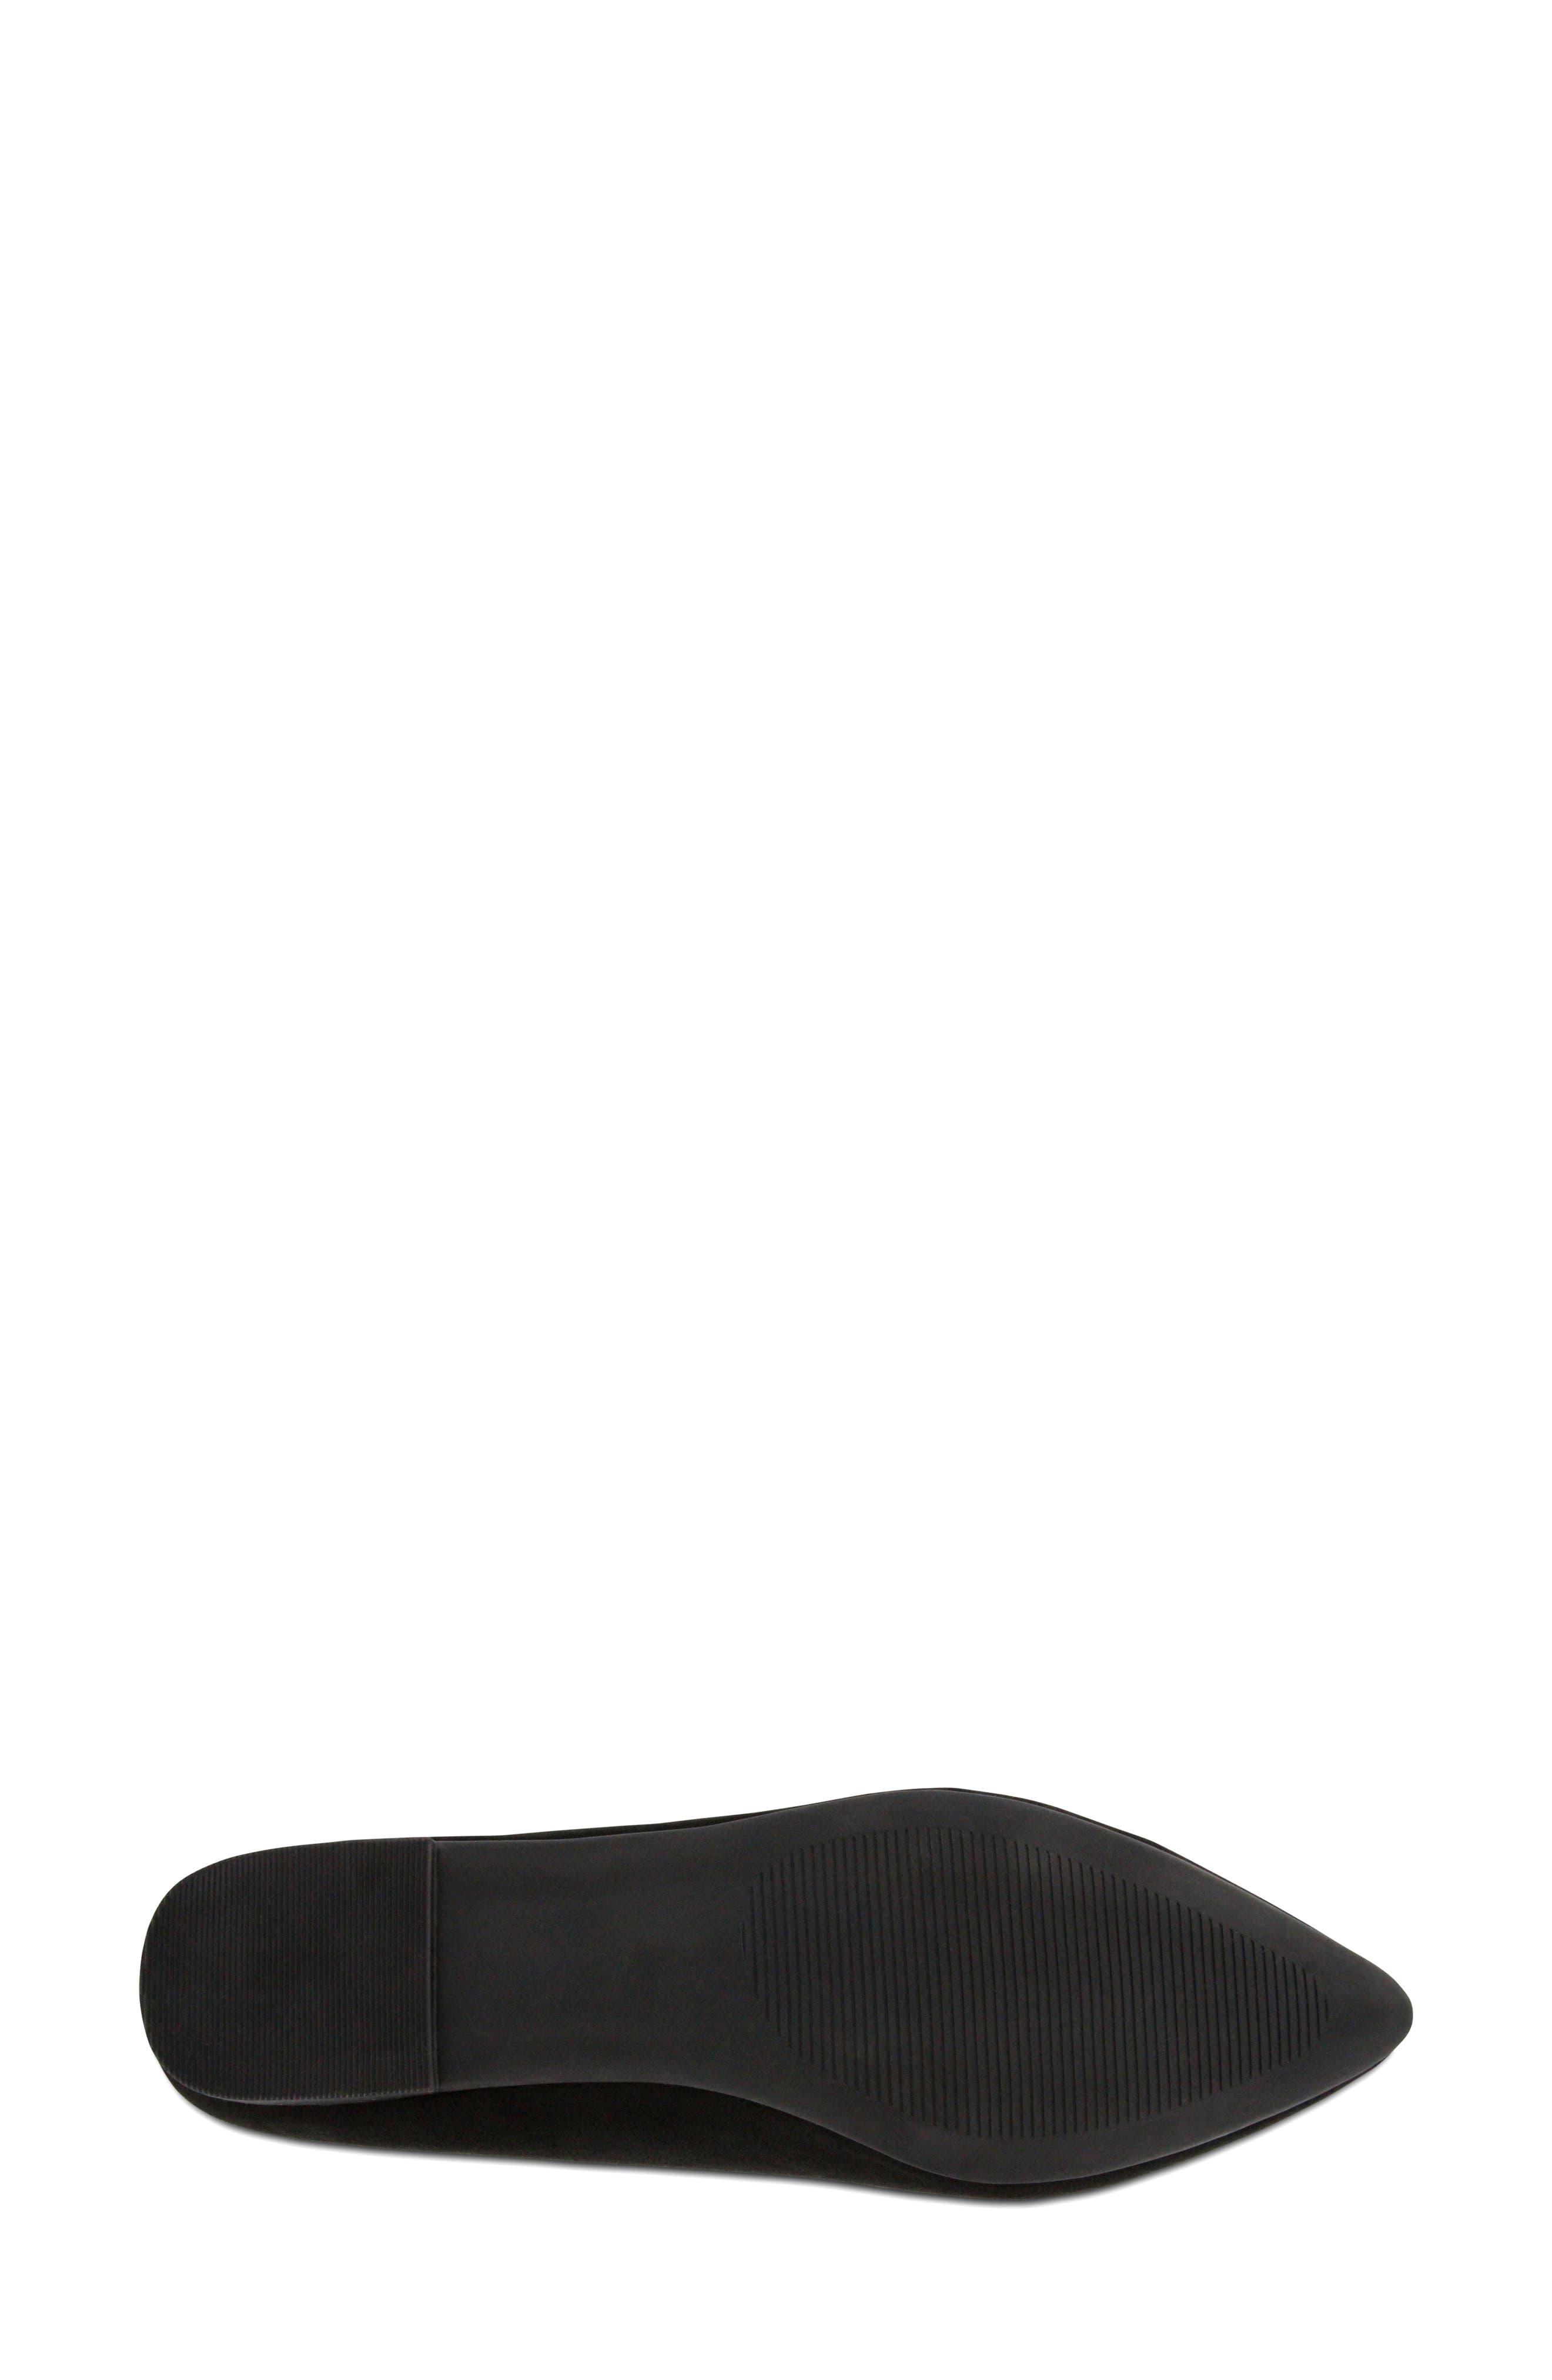 Niles Loafer,                             Alternate thumbnail 5, color,                             Black